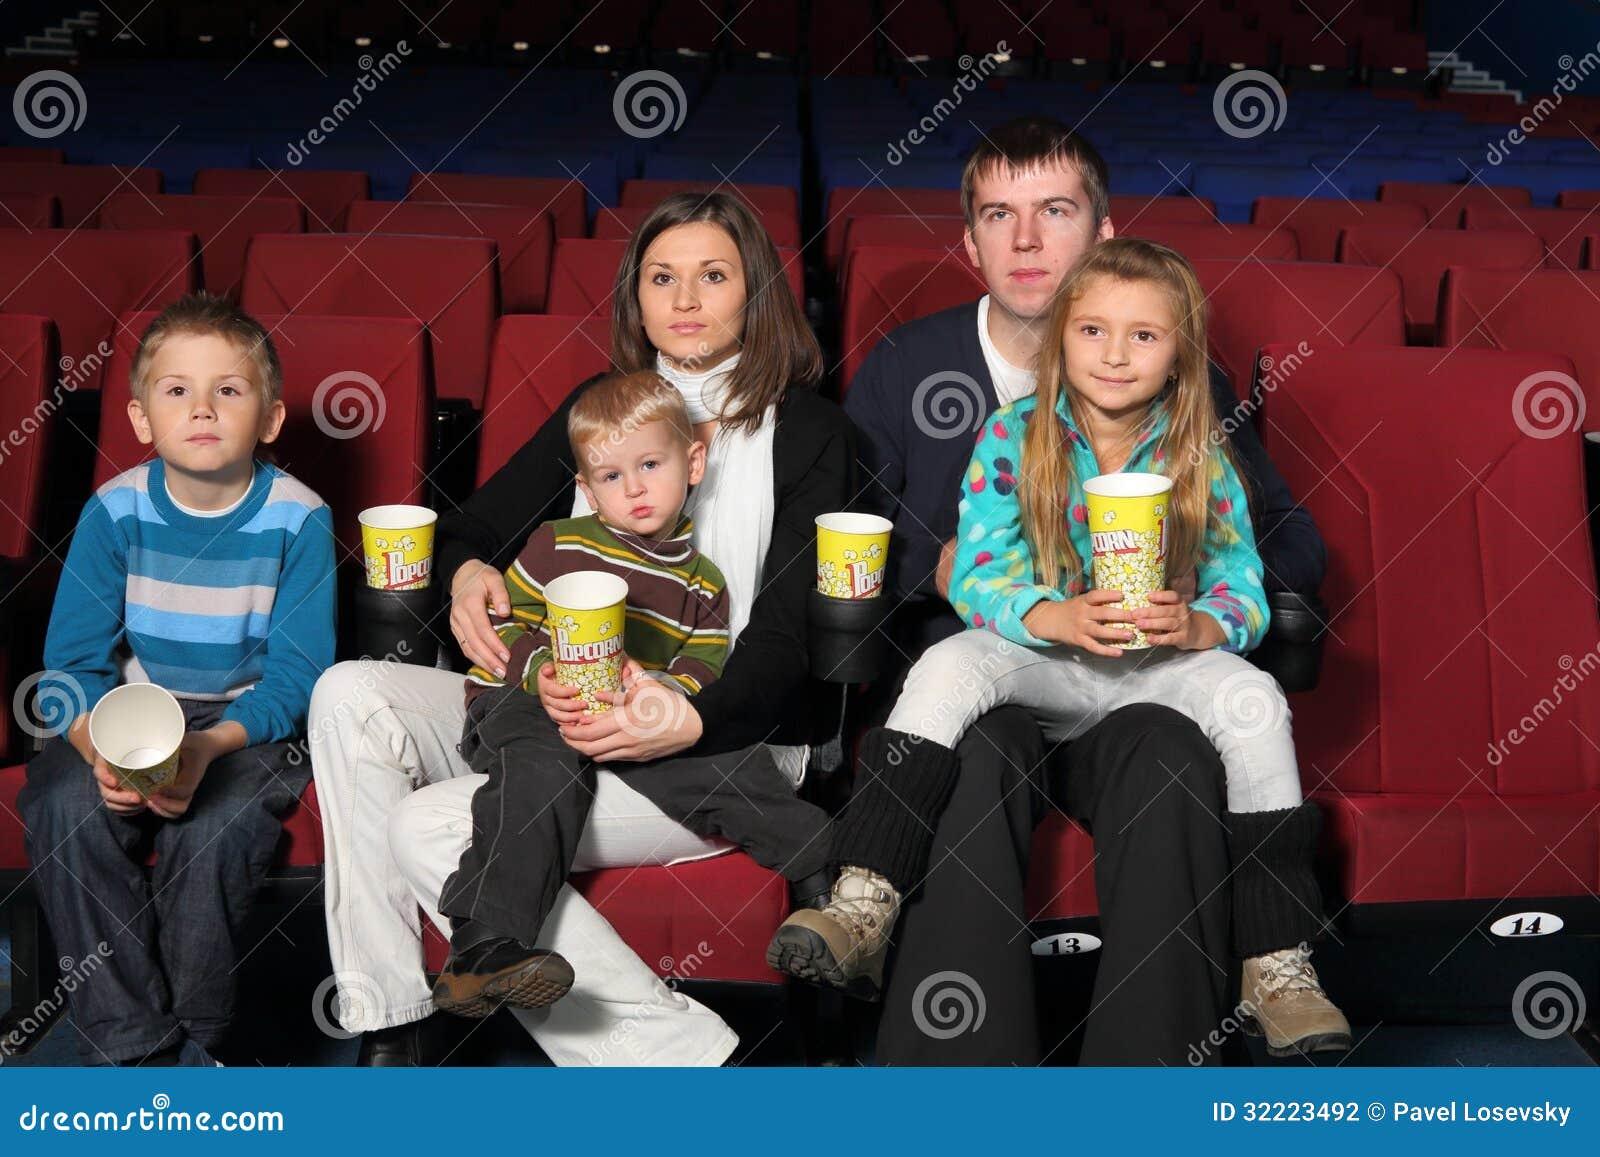 Child cinema images 40